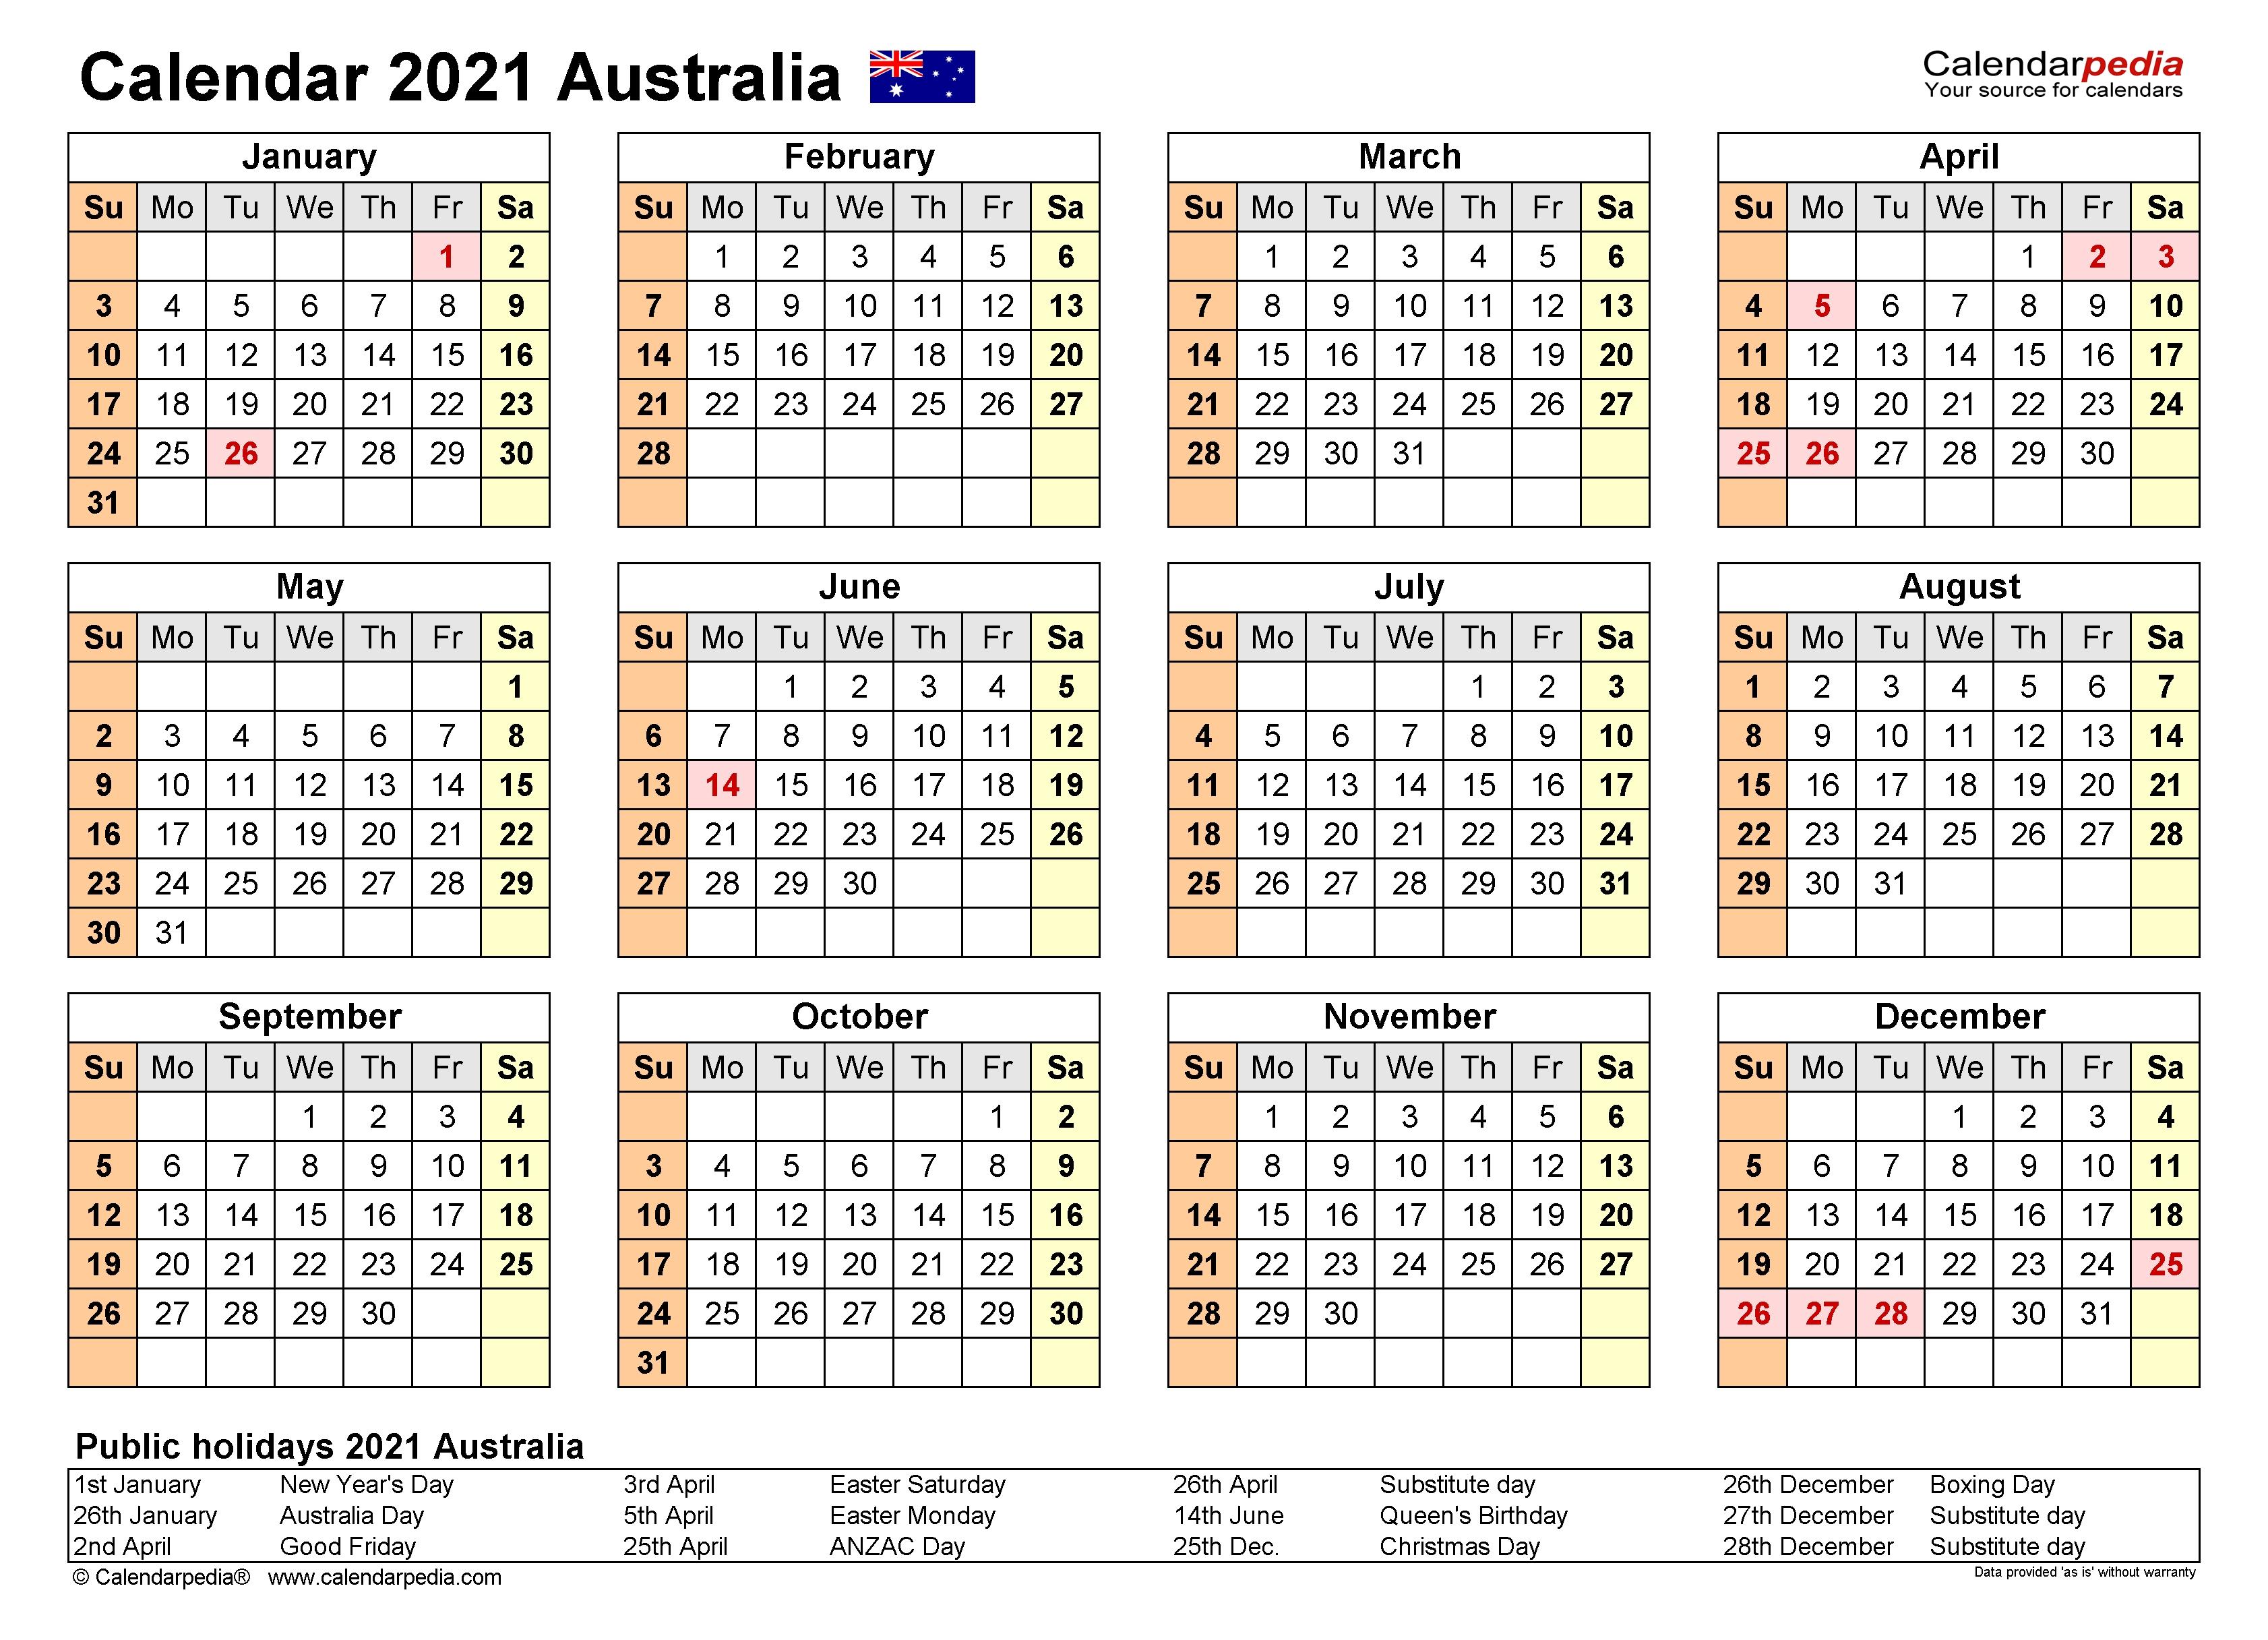 Australia Calendar 2021 - Free Printable Excel Templates  Financial Ytd Calender 2021 Australia